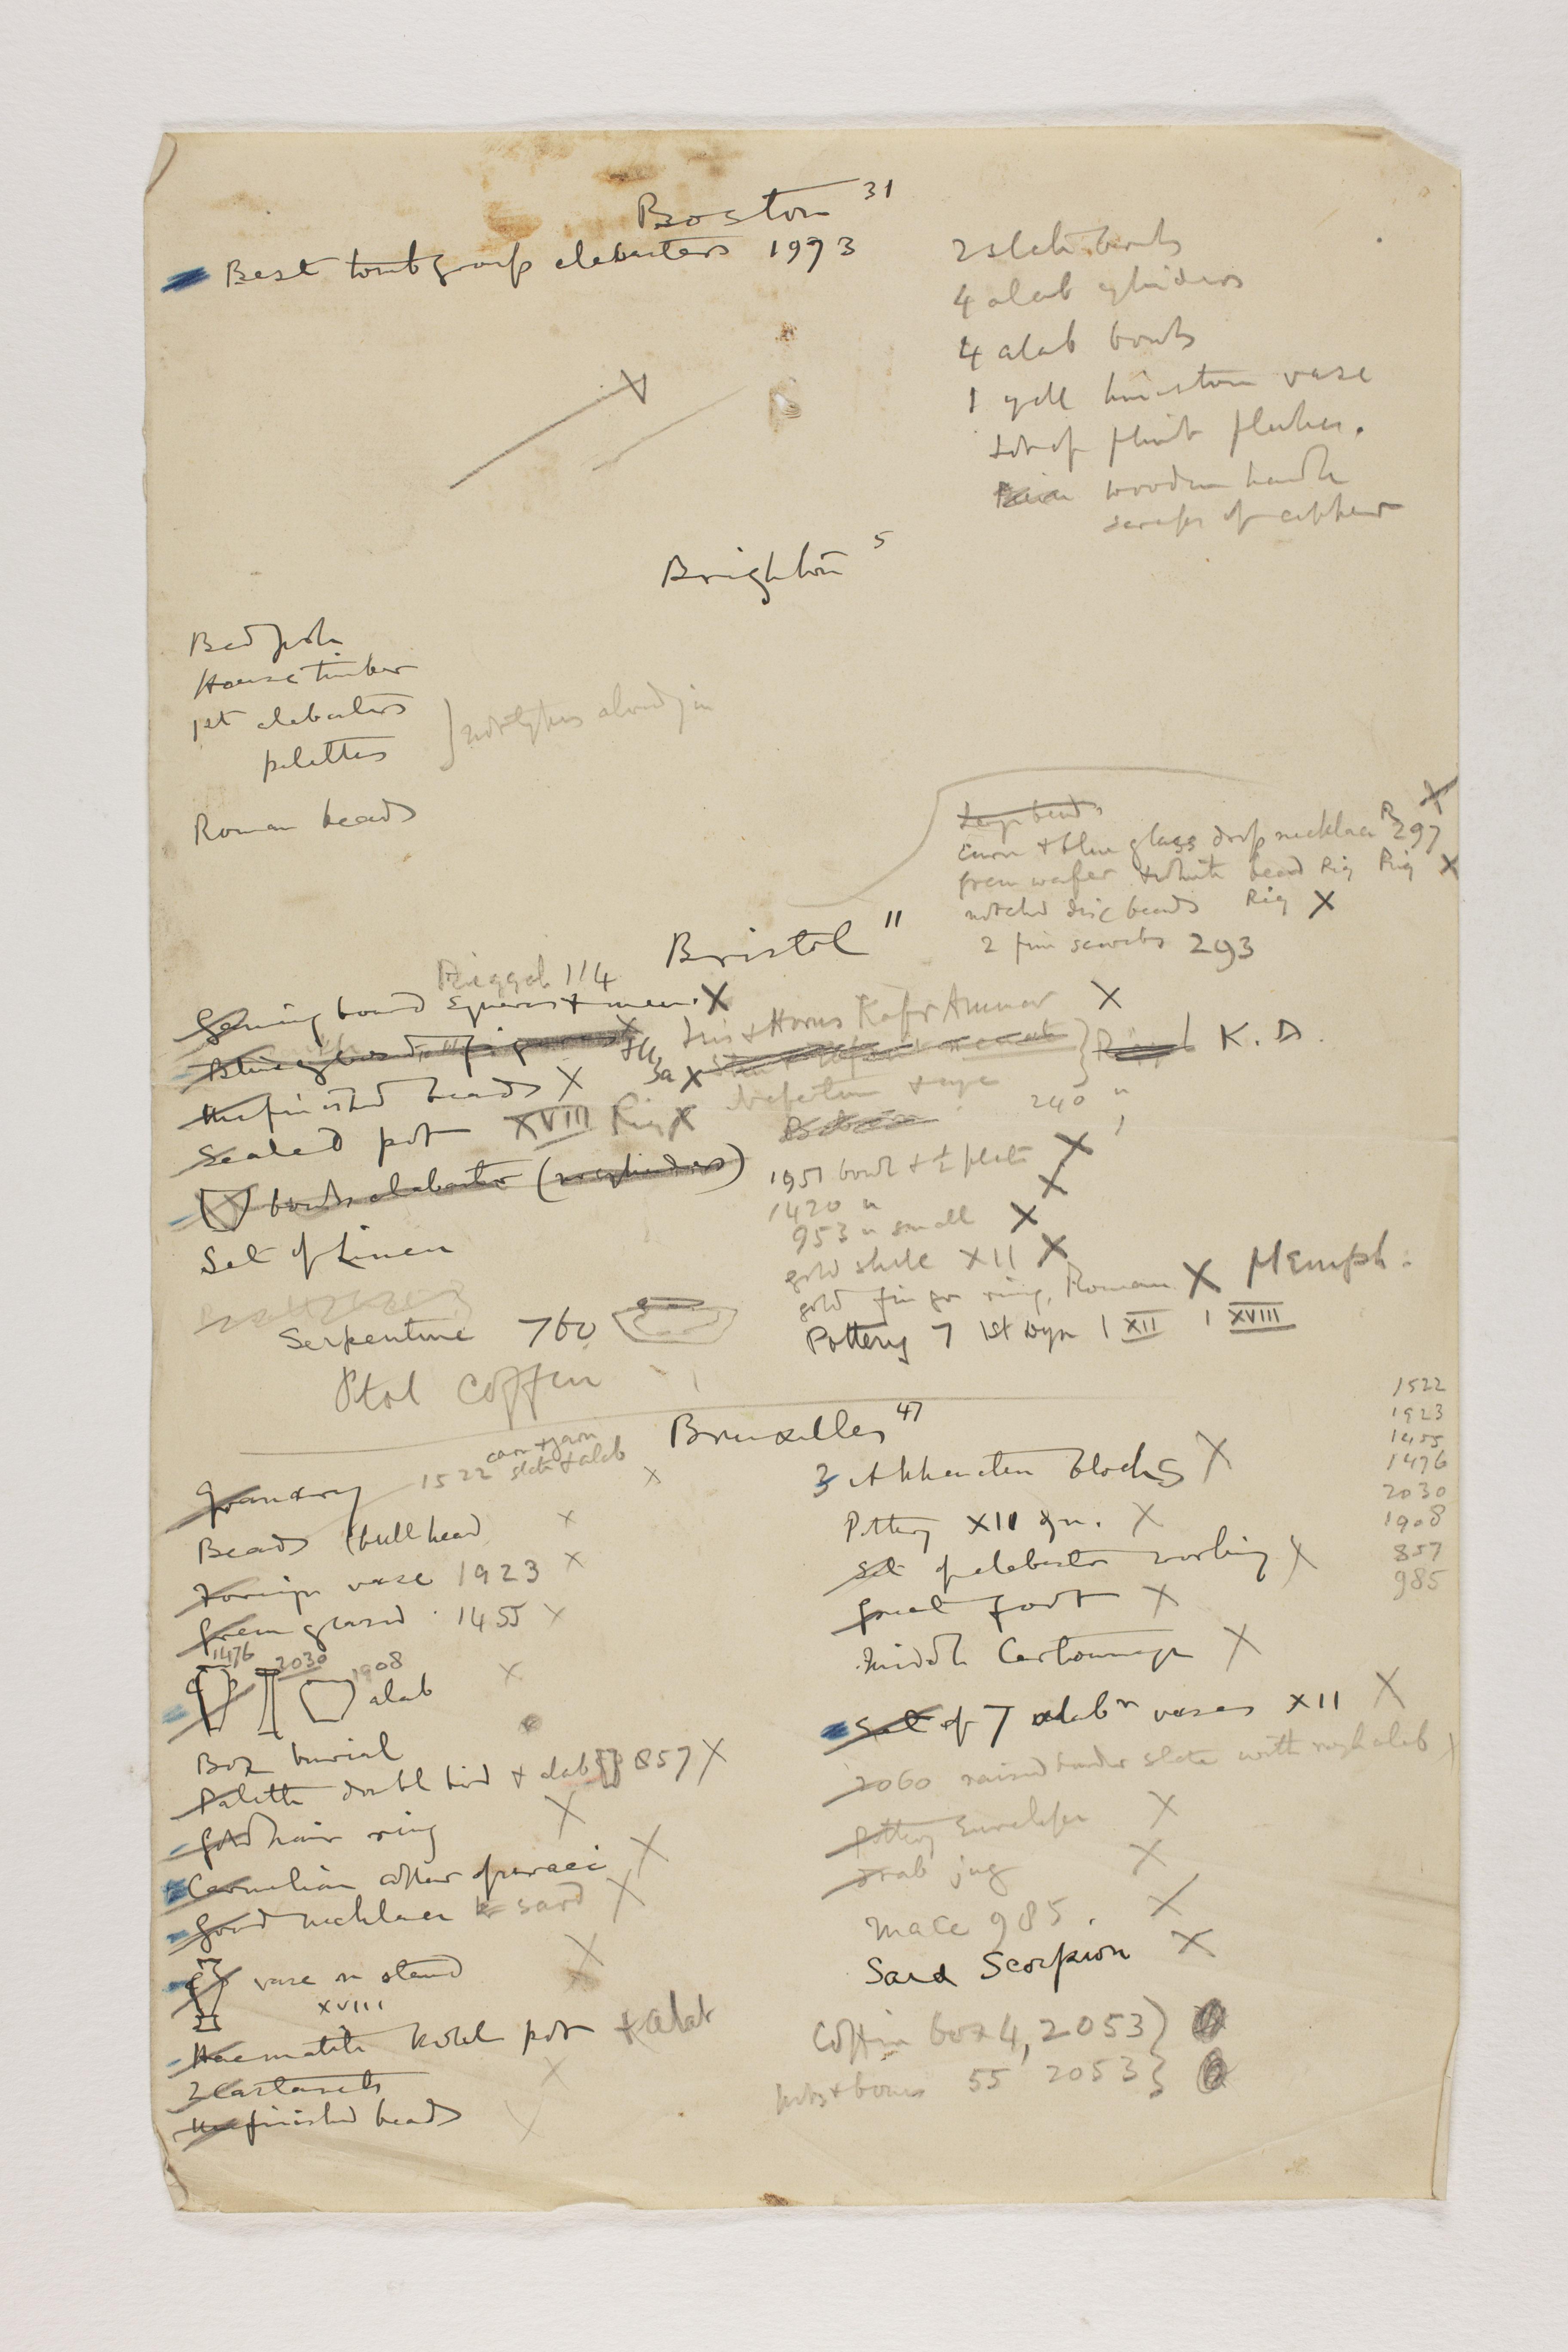 1912-13 Tarkhan, el-Riqqa, Memphis Multiple institution list PMA/WFP1/D/21/6